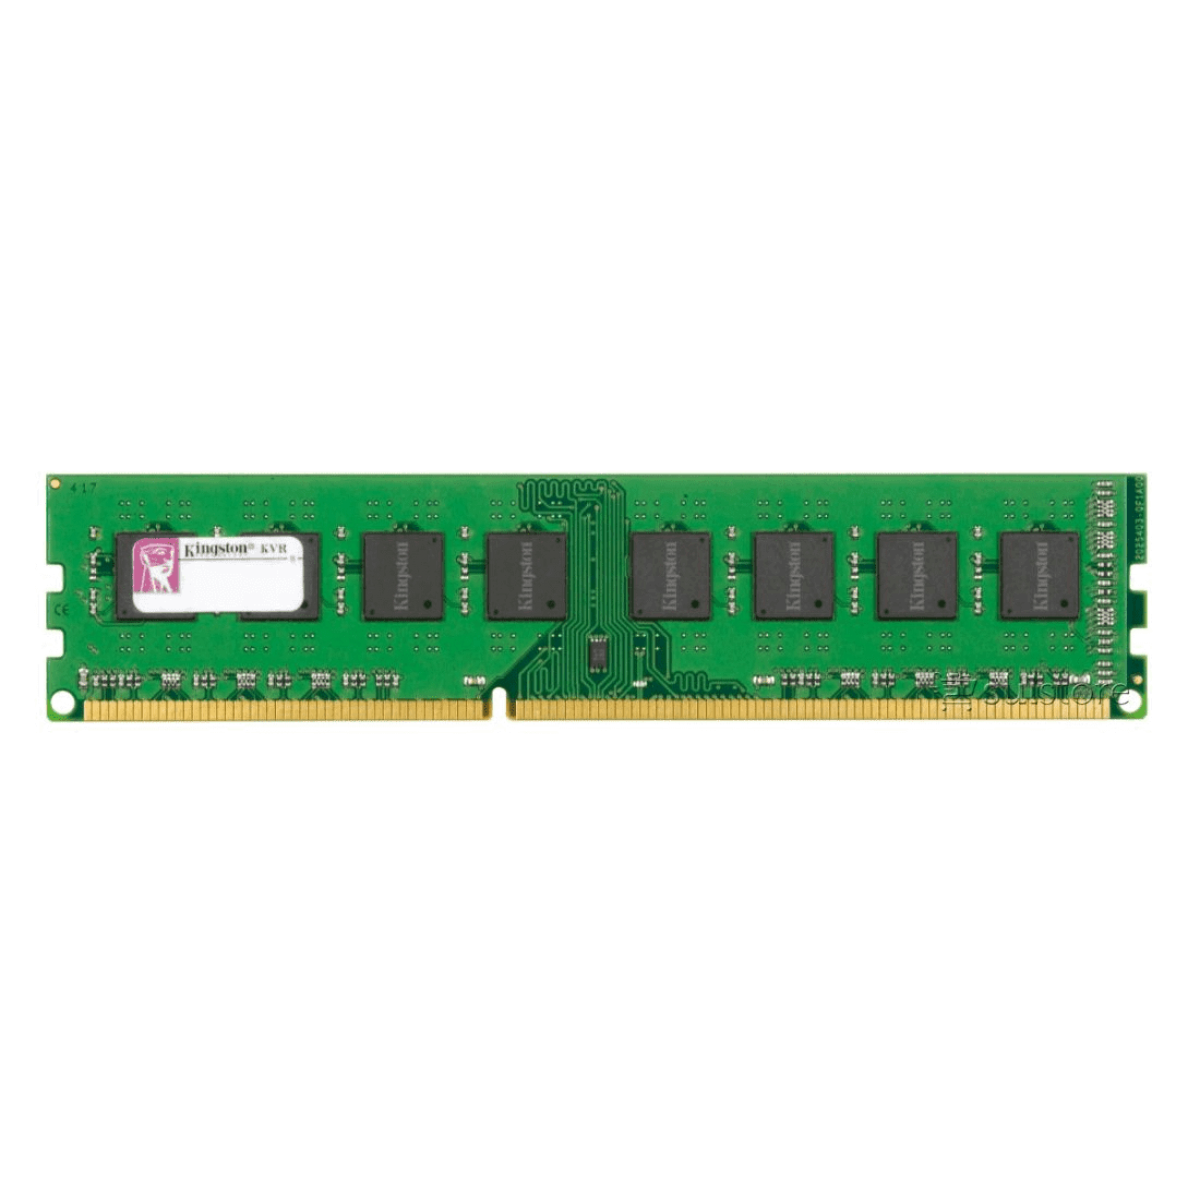 Memória DDR3 Kingston 4GB 1600Mhz, KVR16N11S8/4